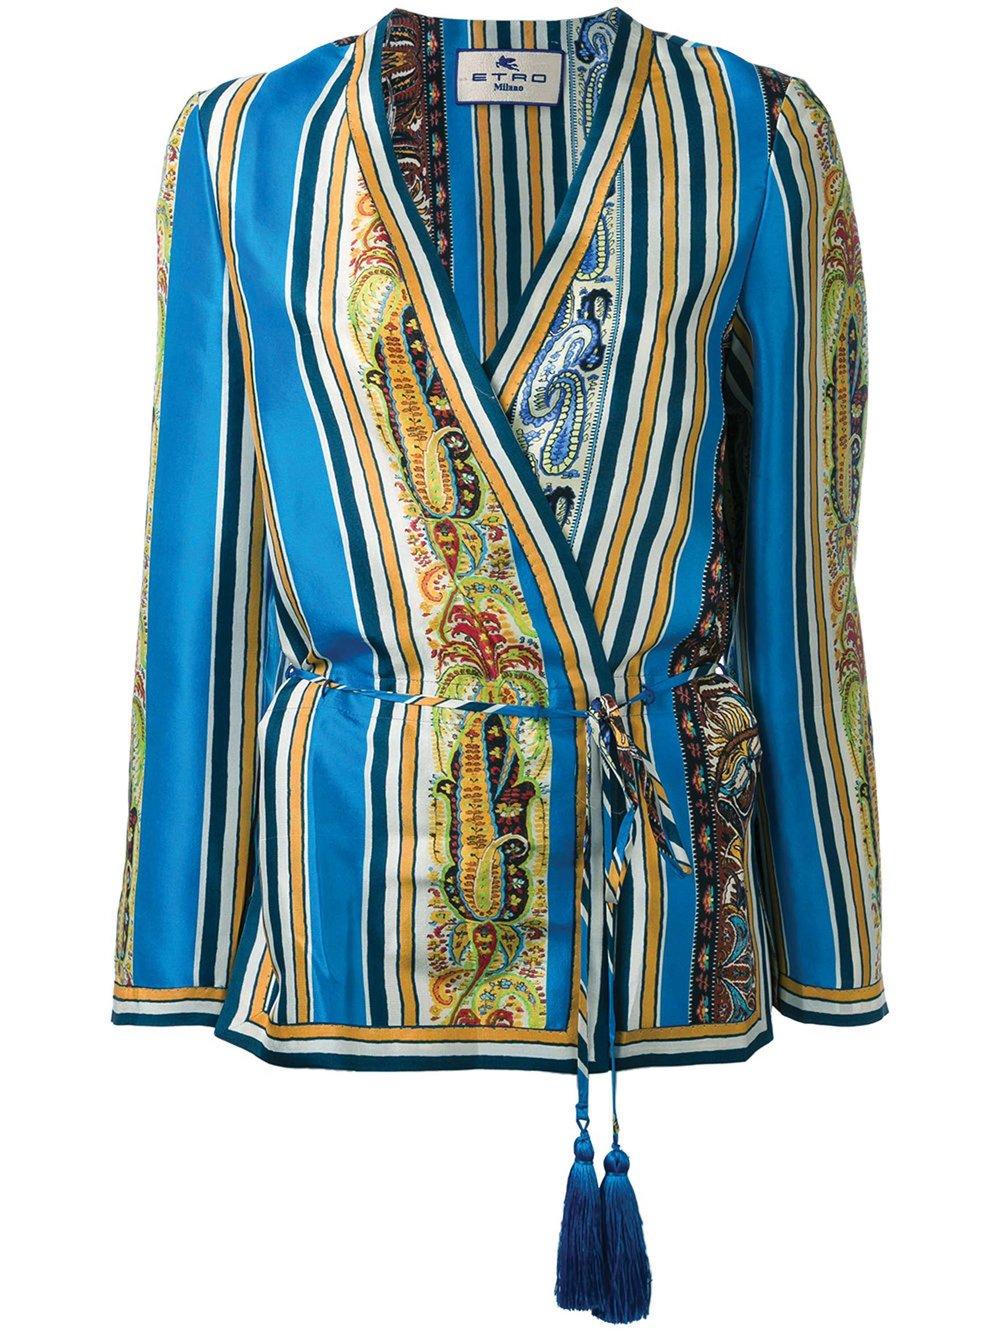 Kimono Blouse by Etro $2,327 艾特羅襯衣